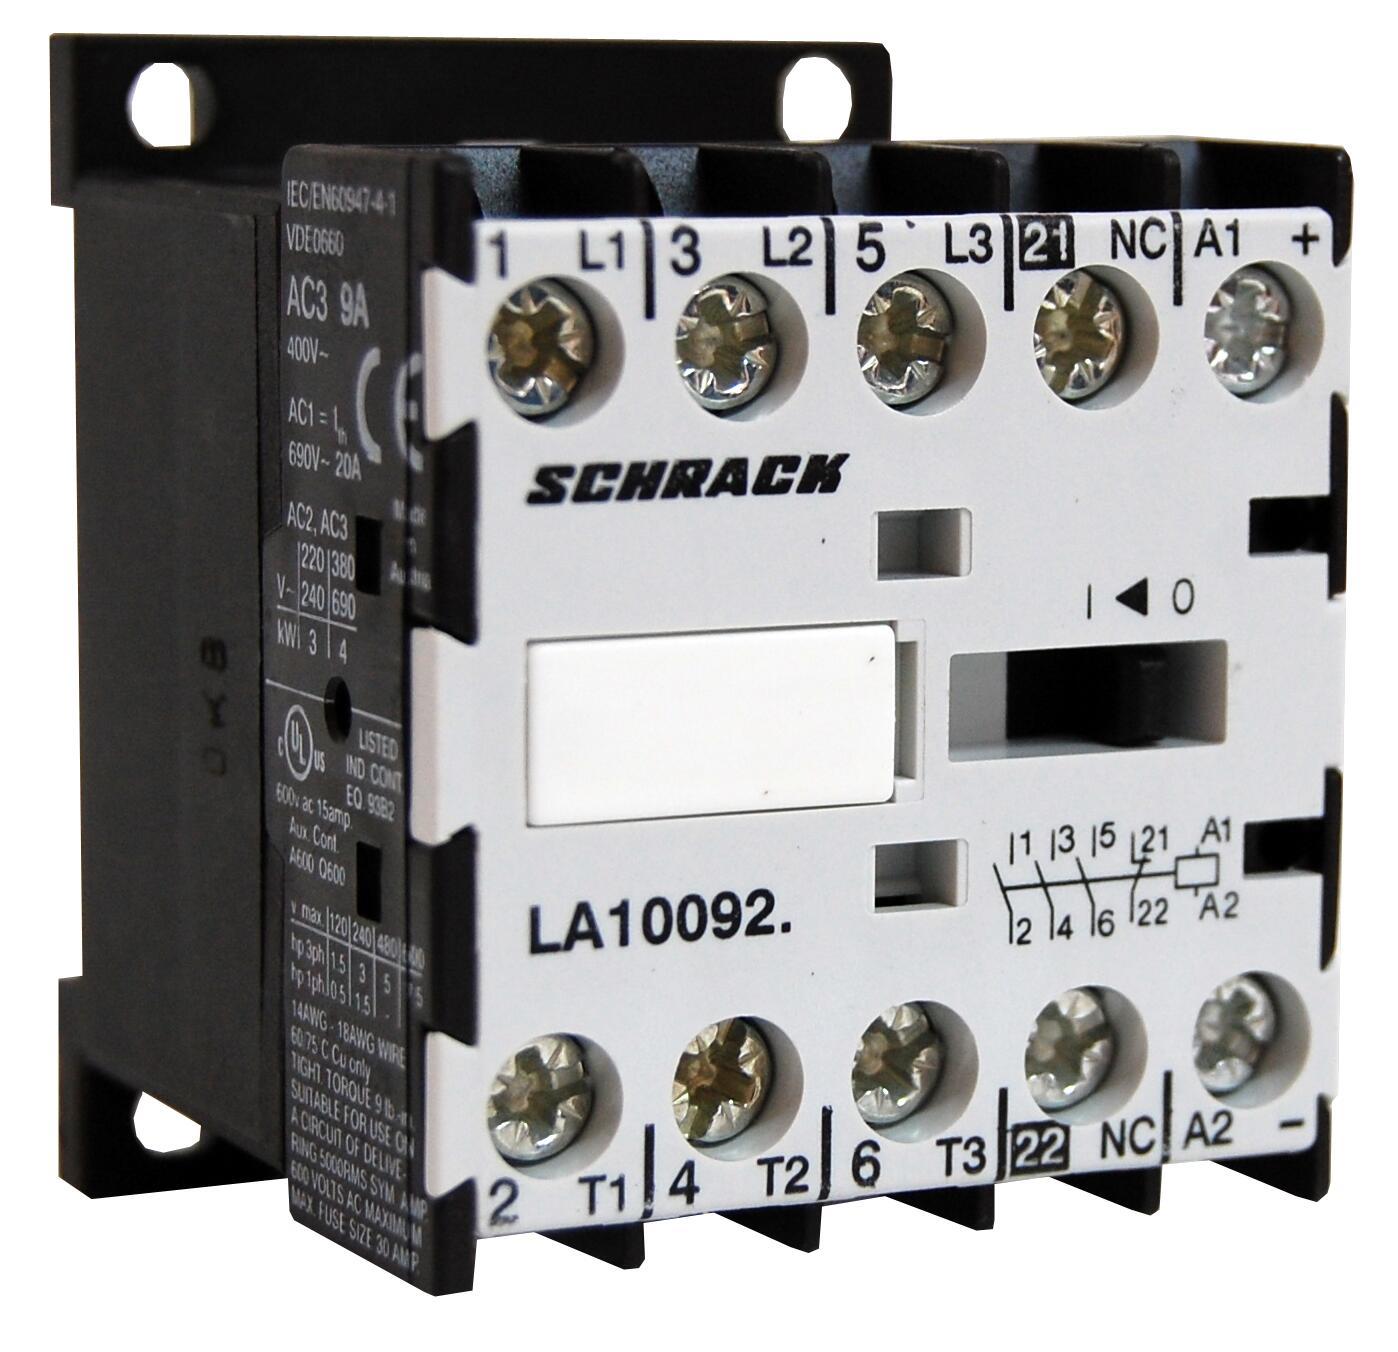 LA100923 - Schrack Technik